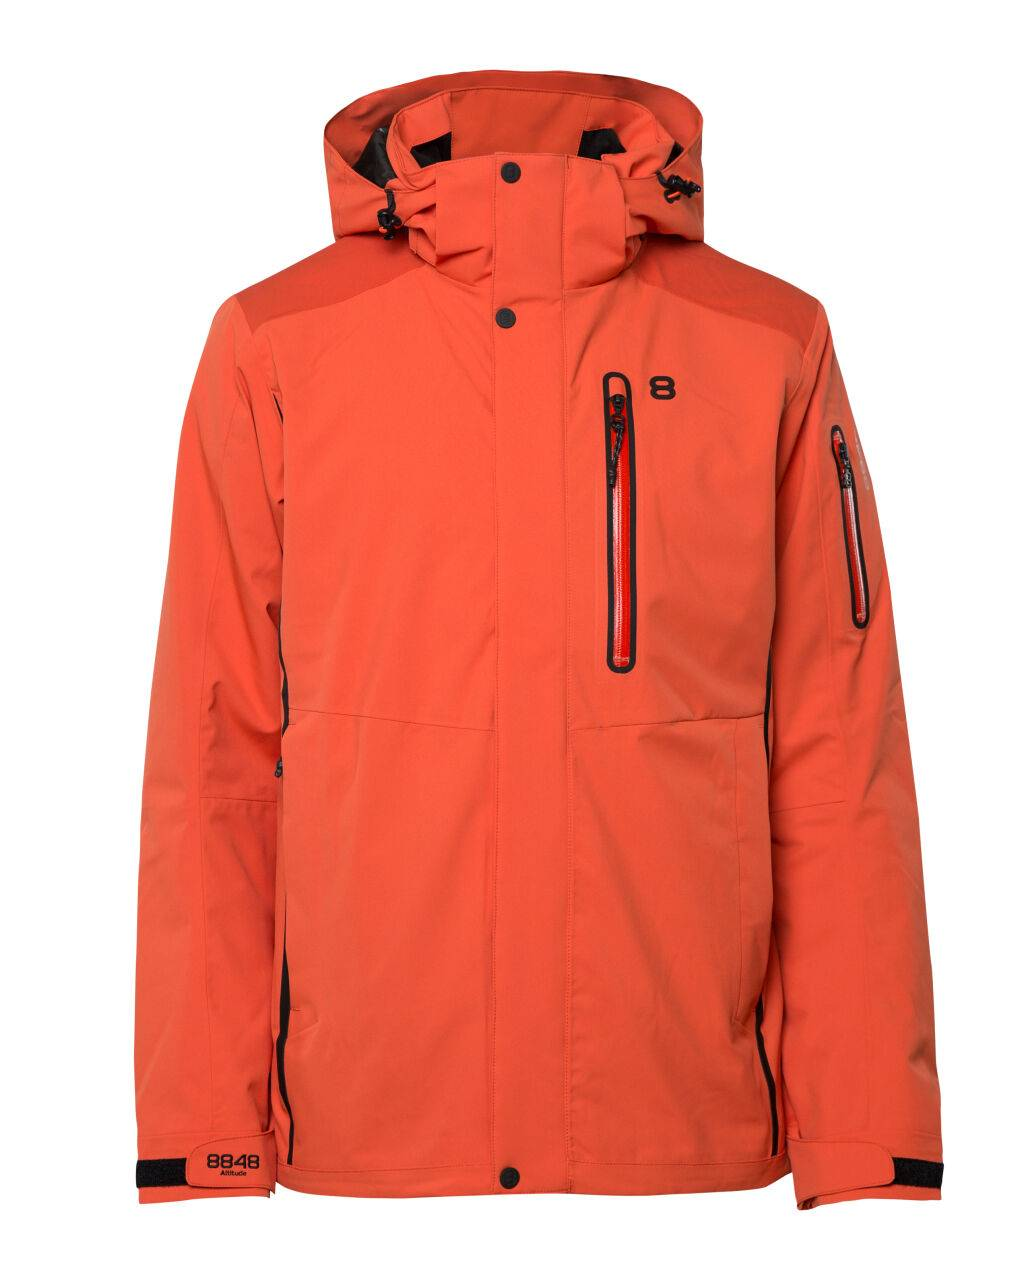 8848 Altitude Castor jacket mMiesten toppatakki